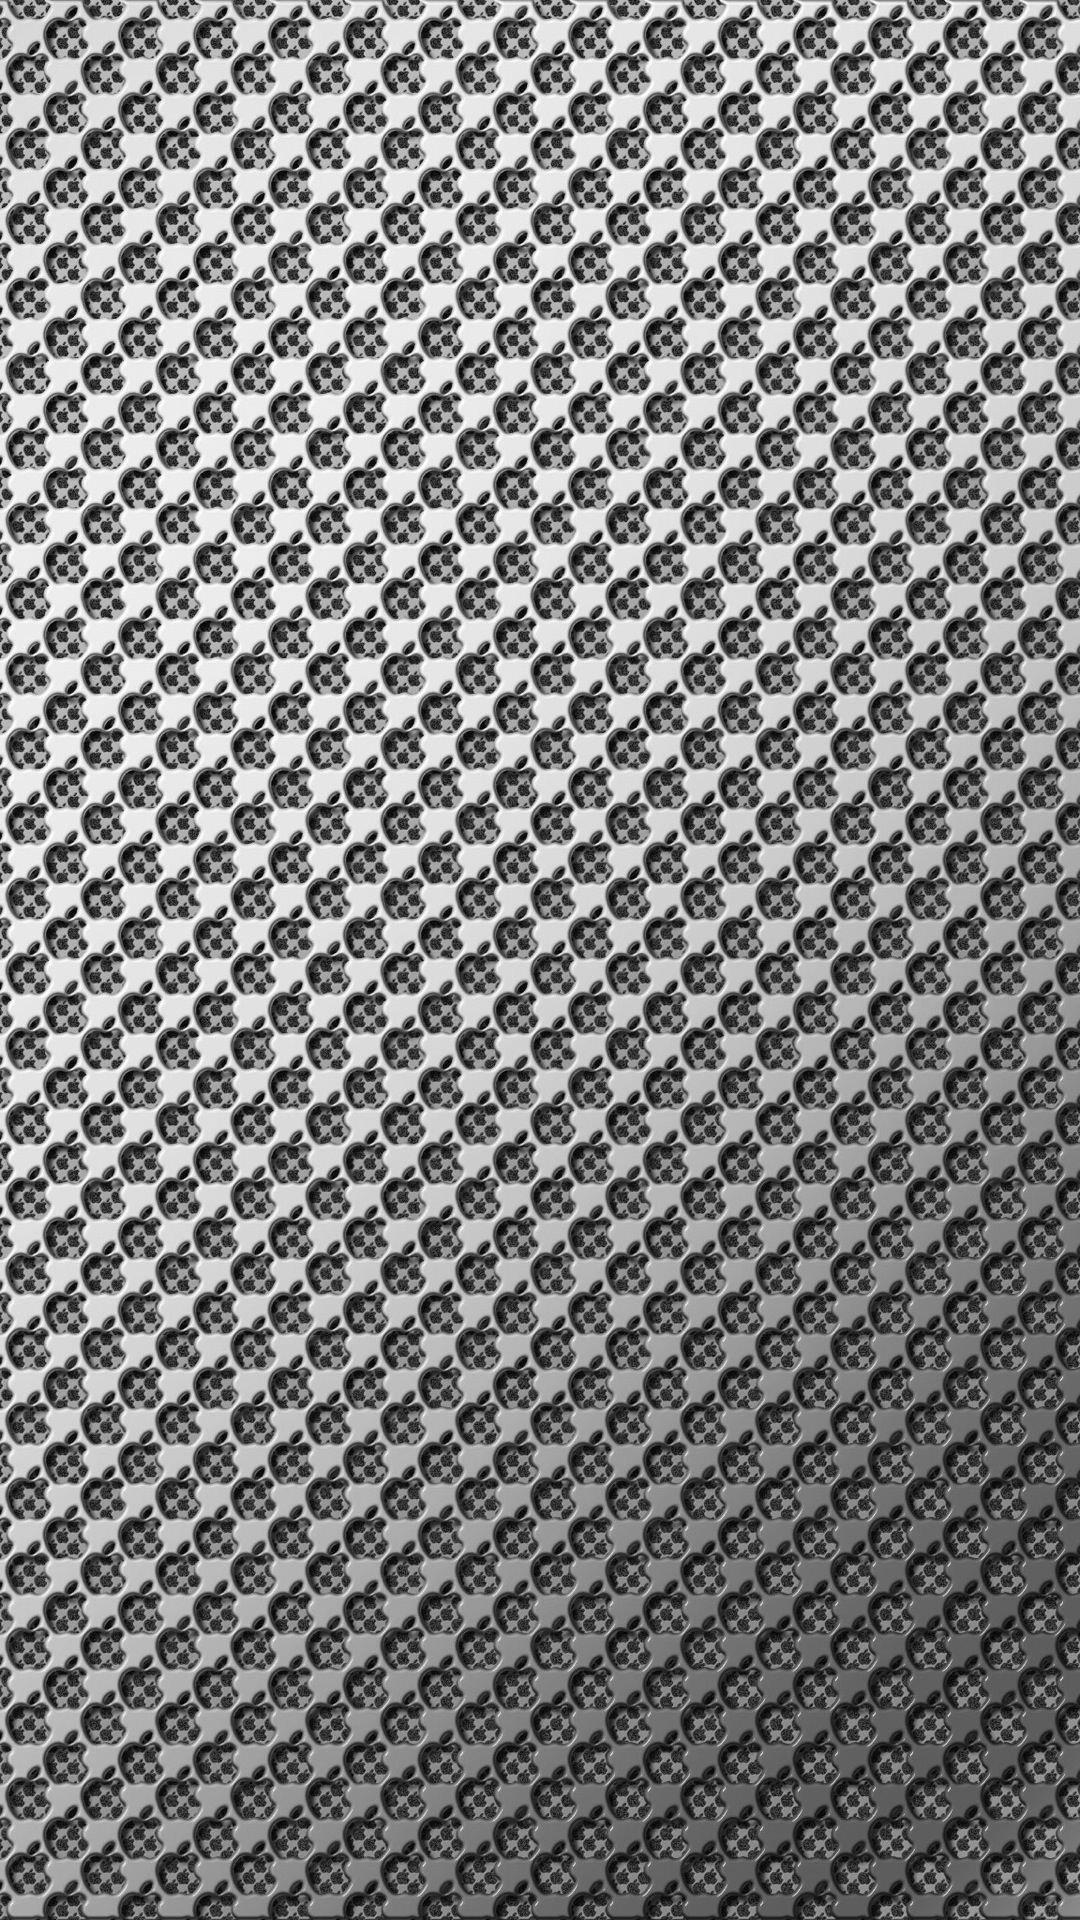 Apple Metal Silver Wallpaper Sc Smartphone